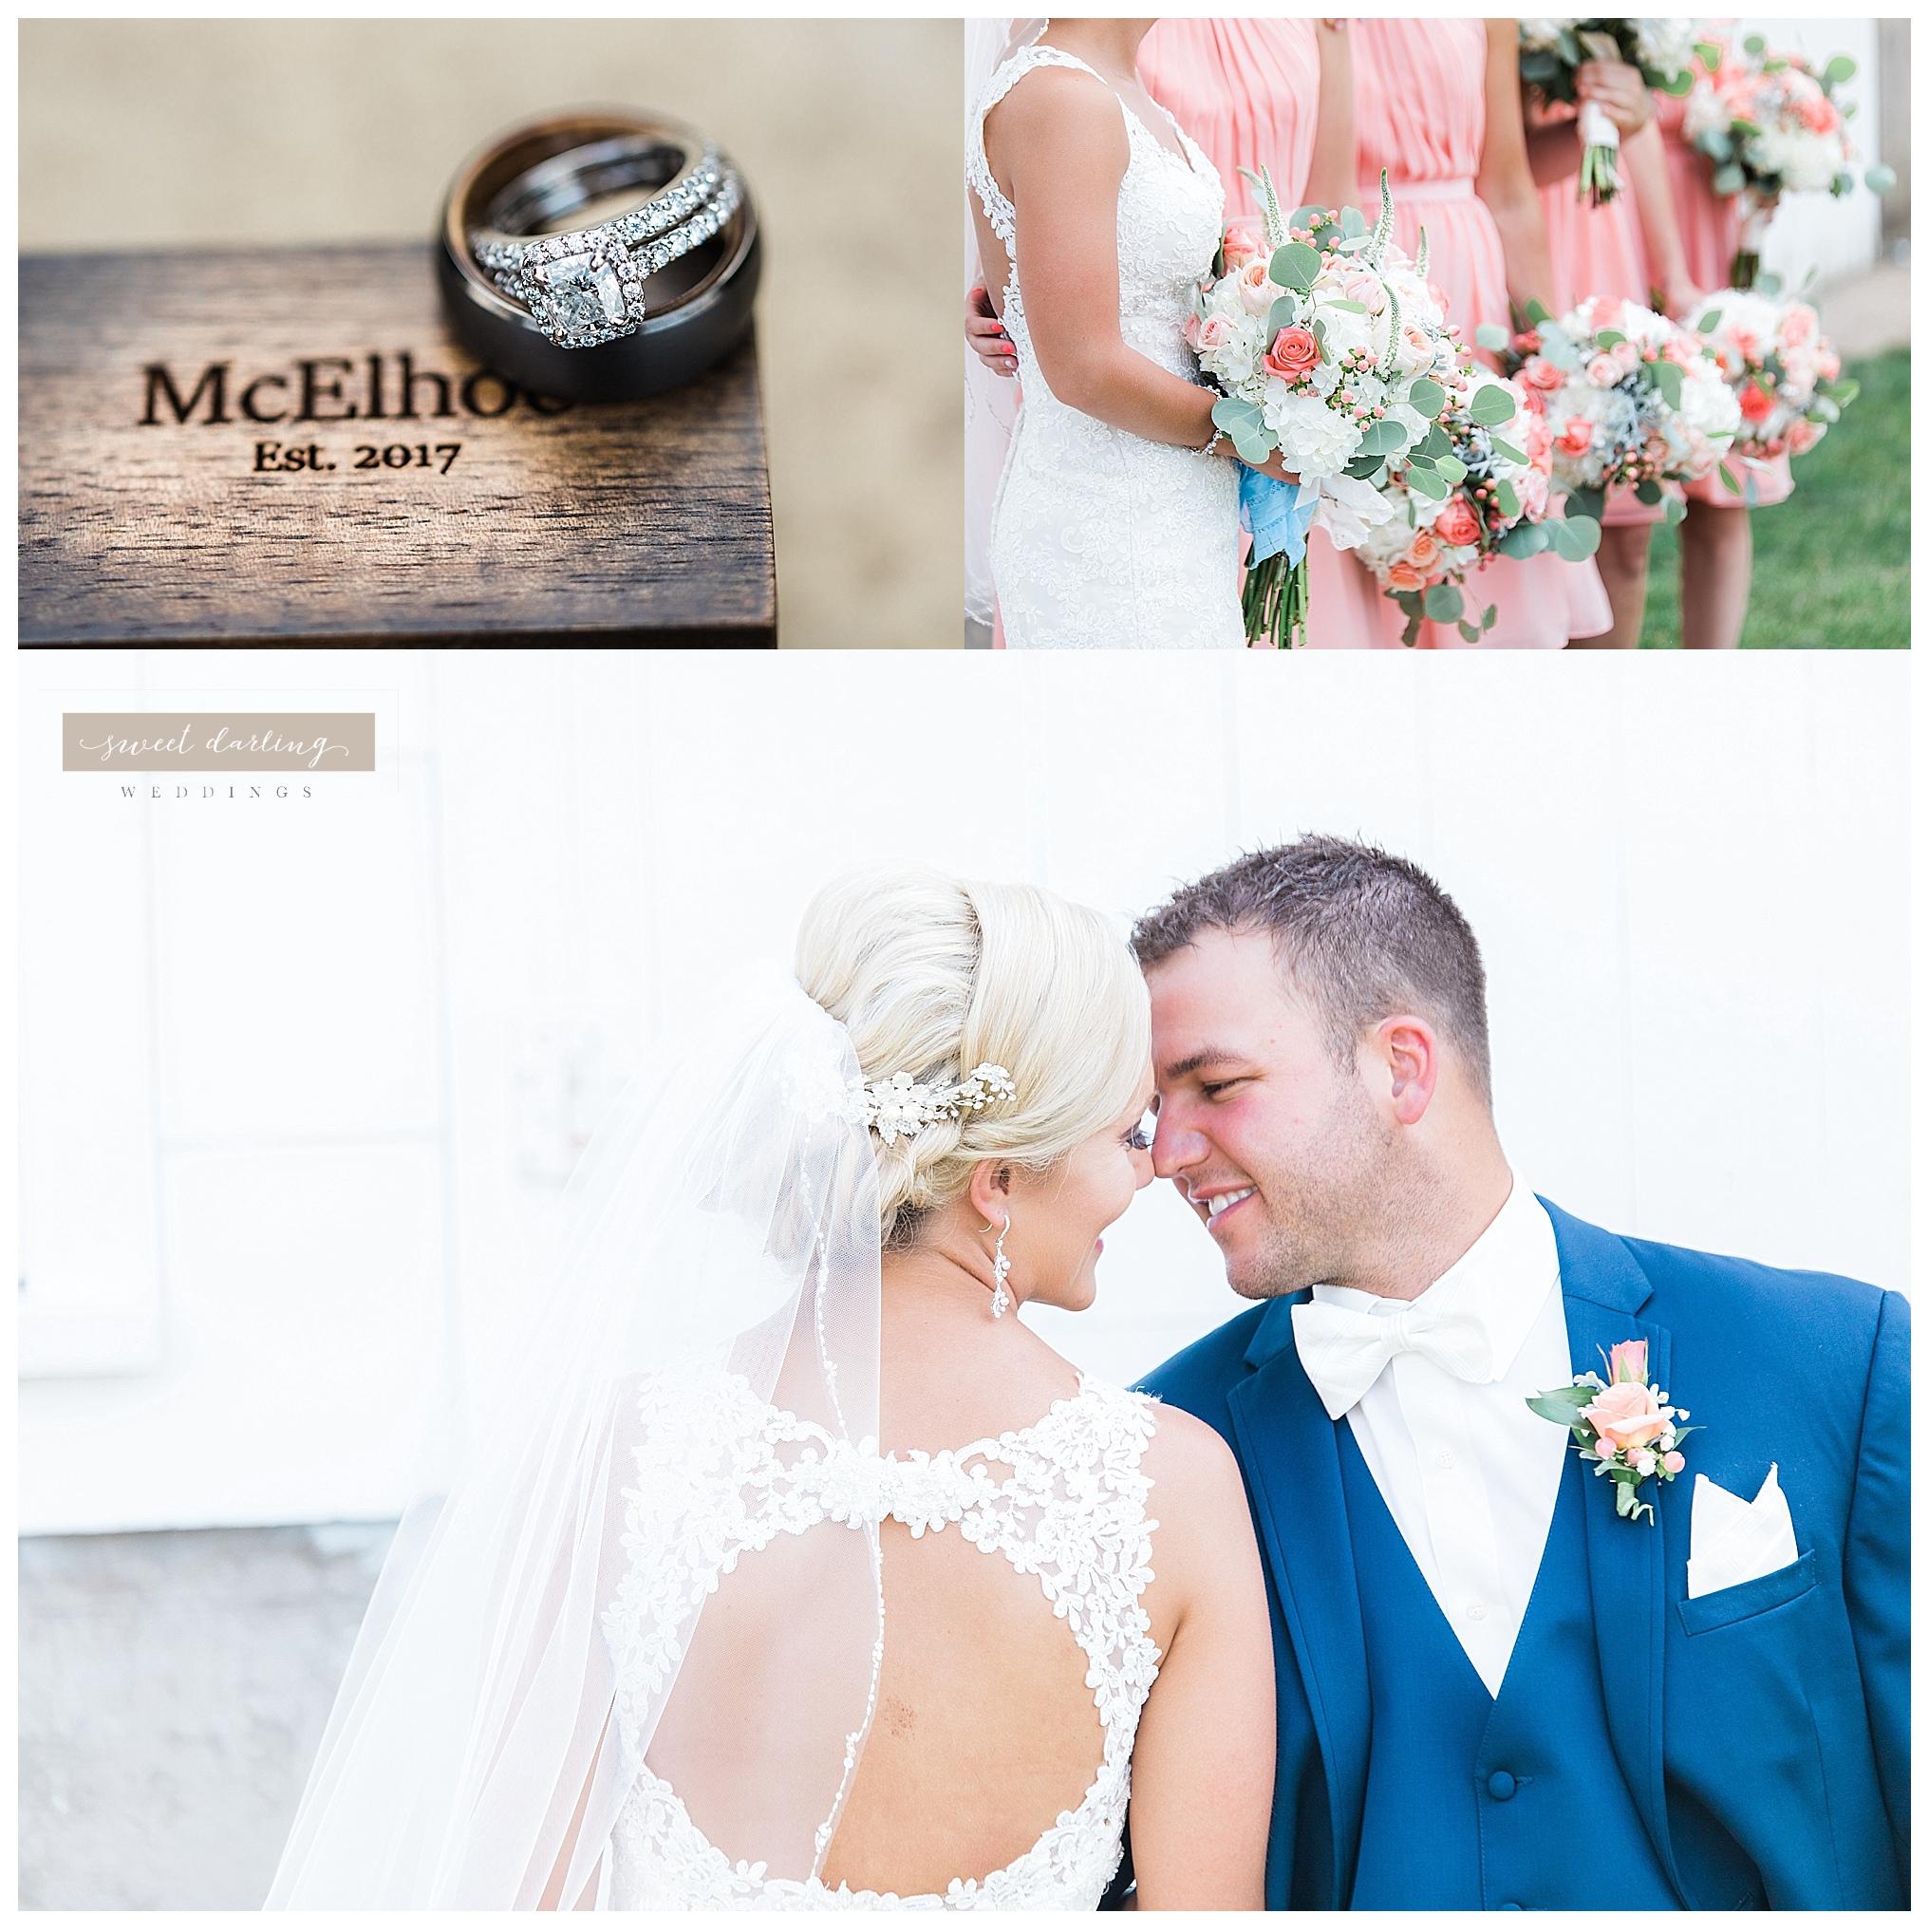 Paxton-illinois-engelbrecht-farmstead-romantic-wedding-photographer-sweet-darling-weddings_1219.jpg